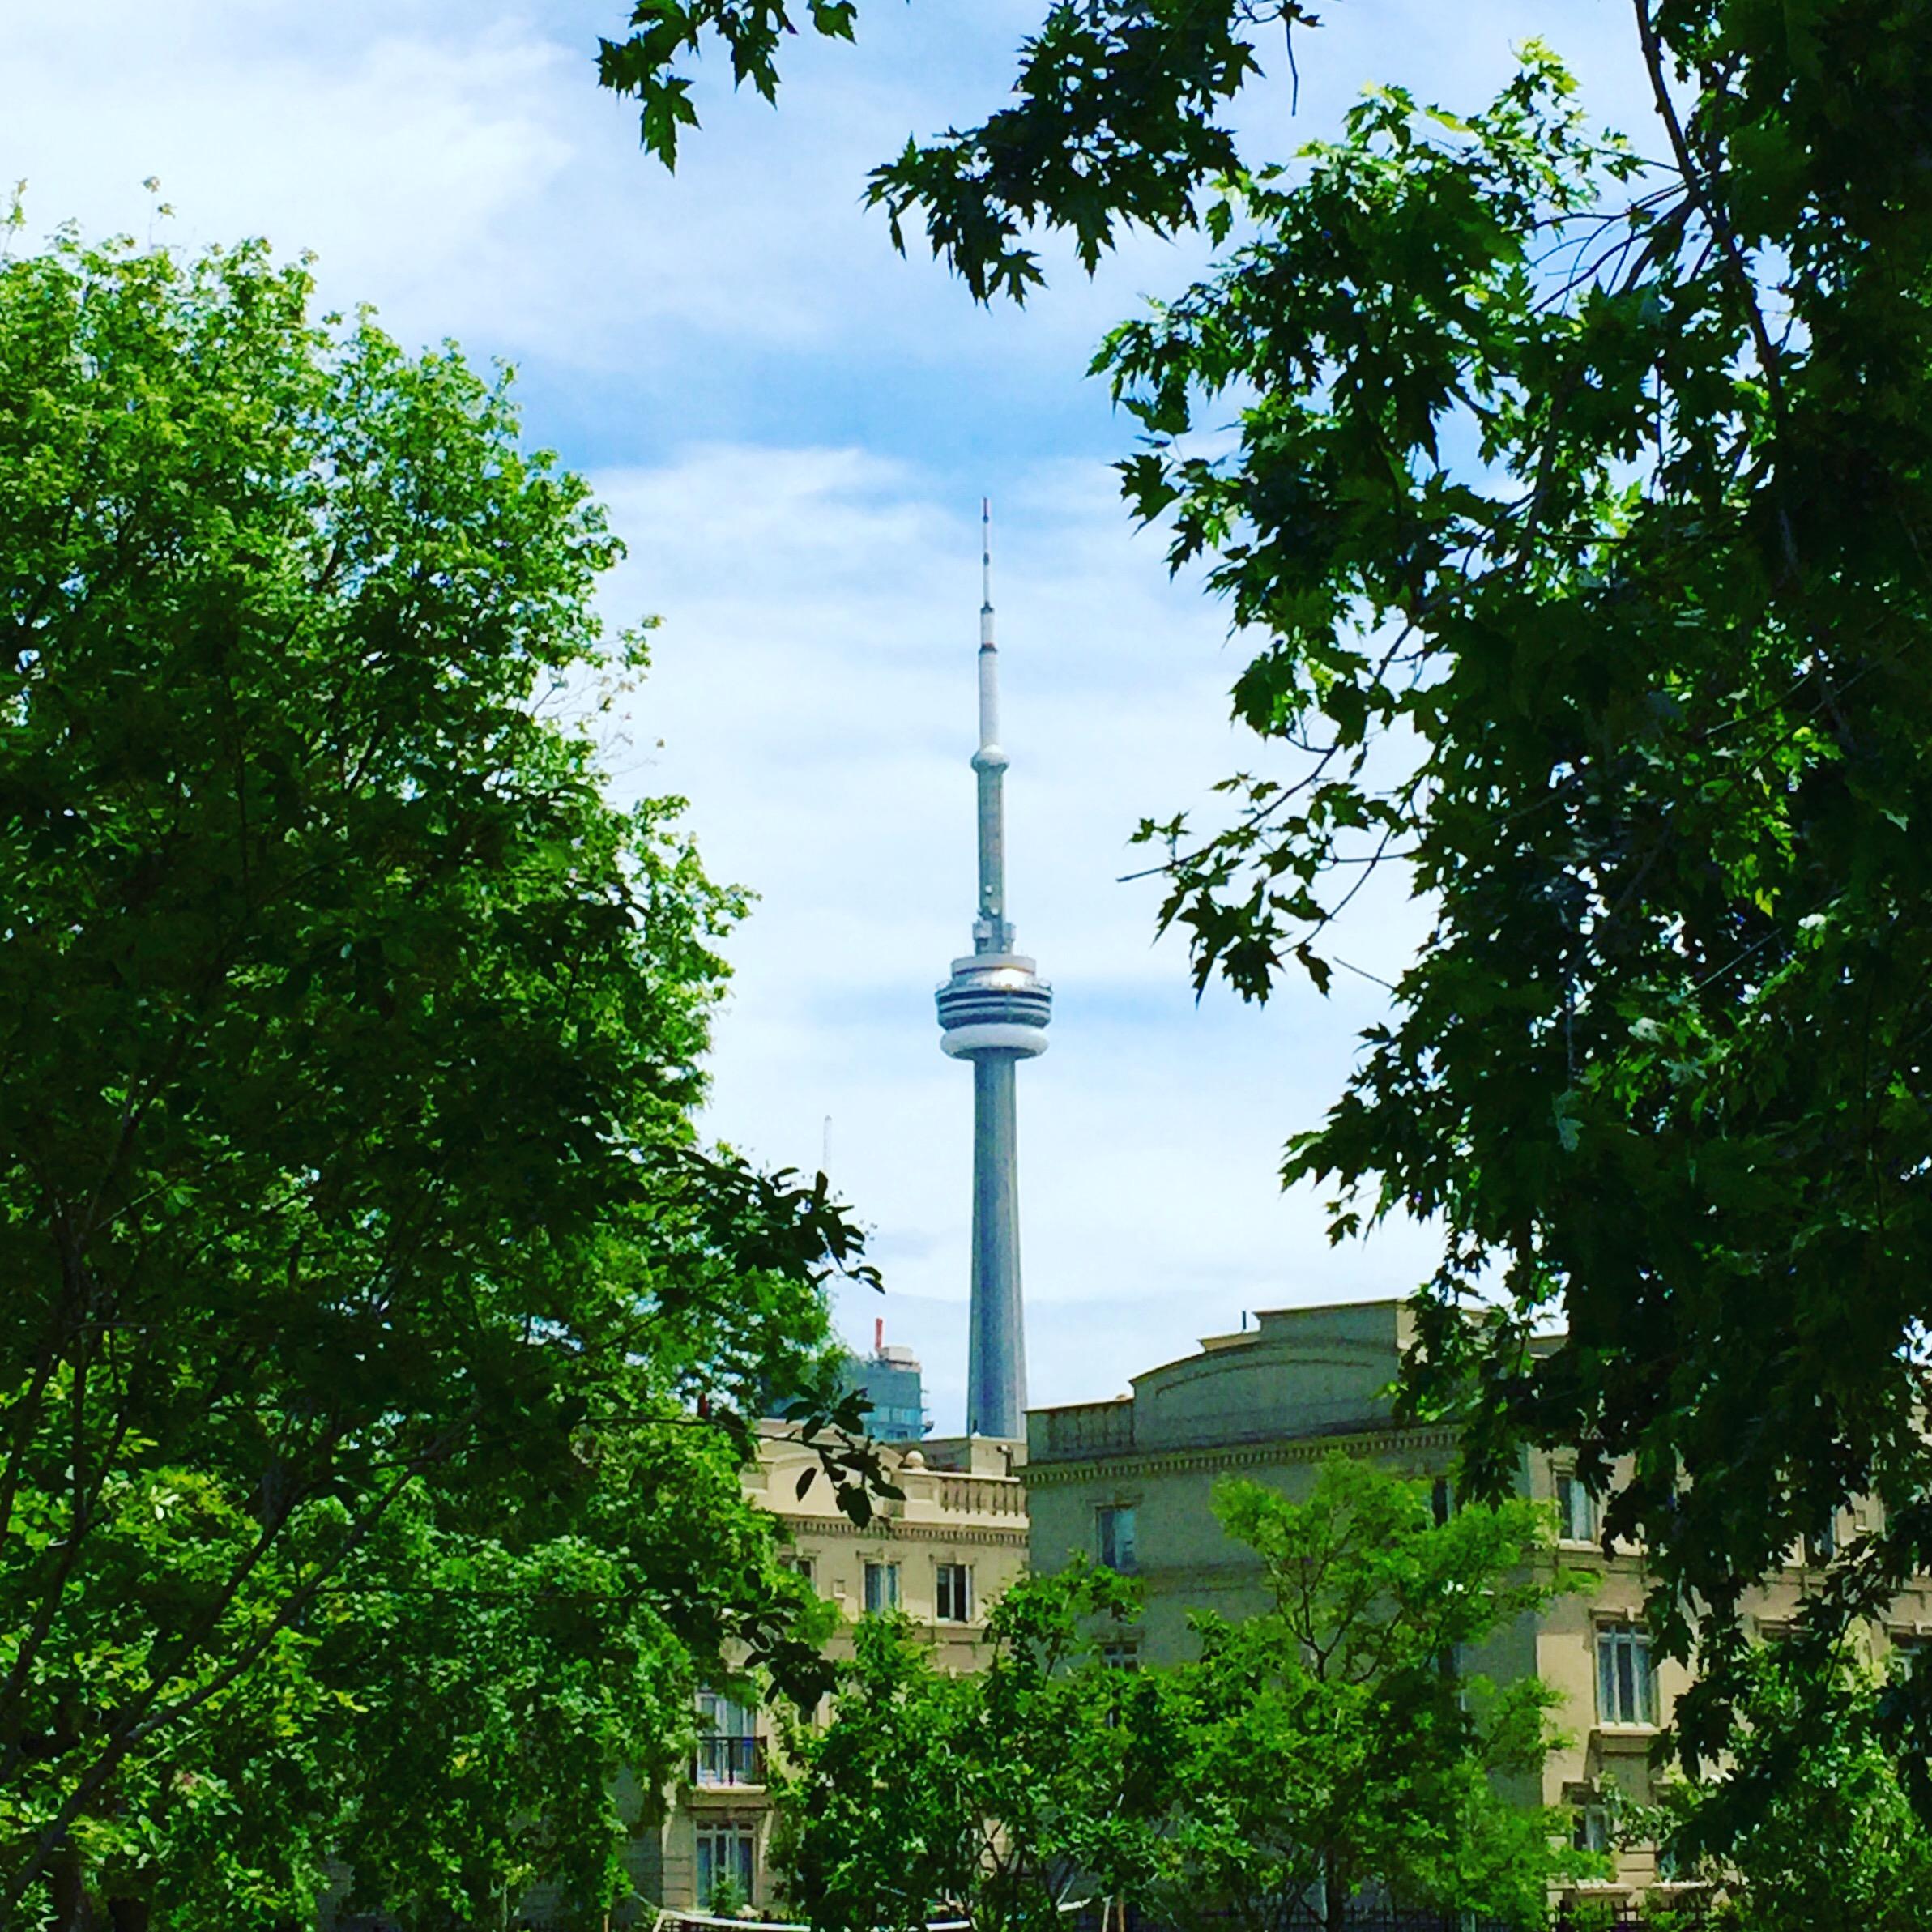 Toronto, ON, Canada, May 2018